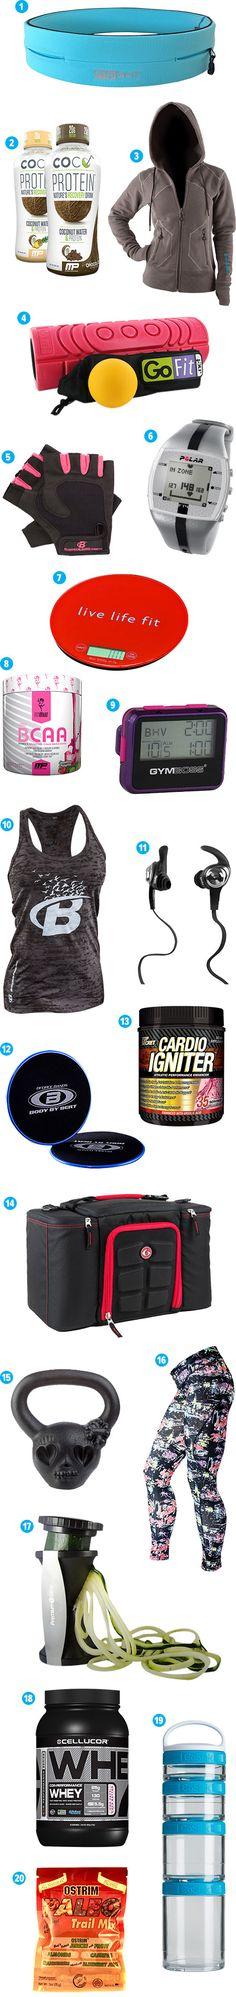 Bodybuilding.com - Workout Gear For Women